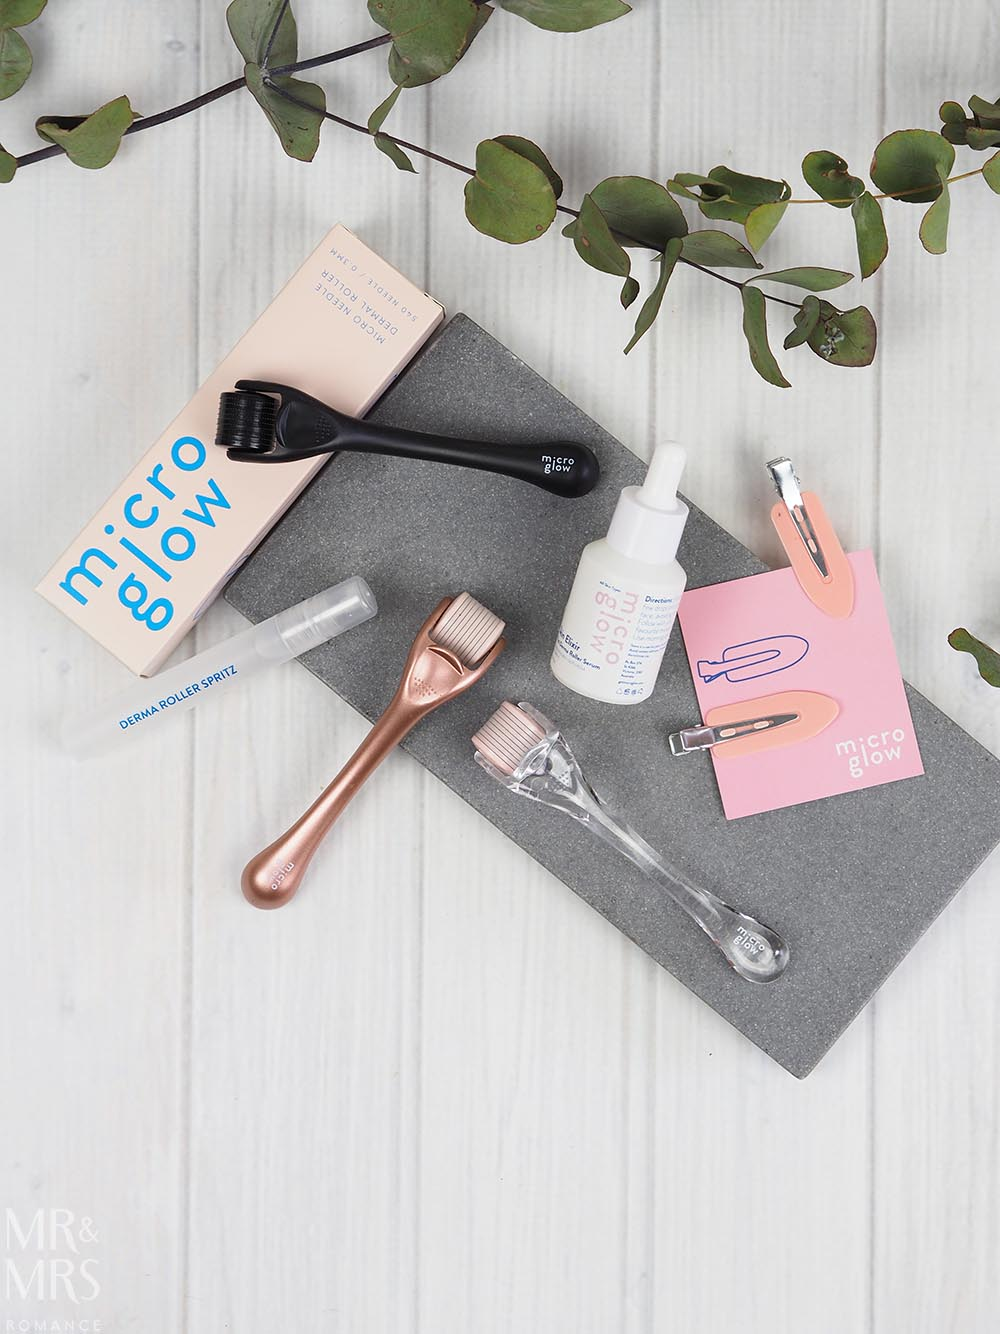 Microglow - Cosmetics gift ideas